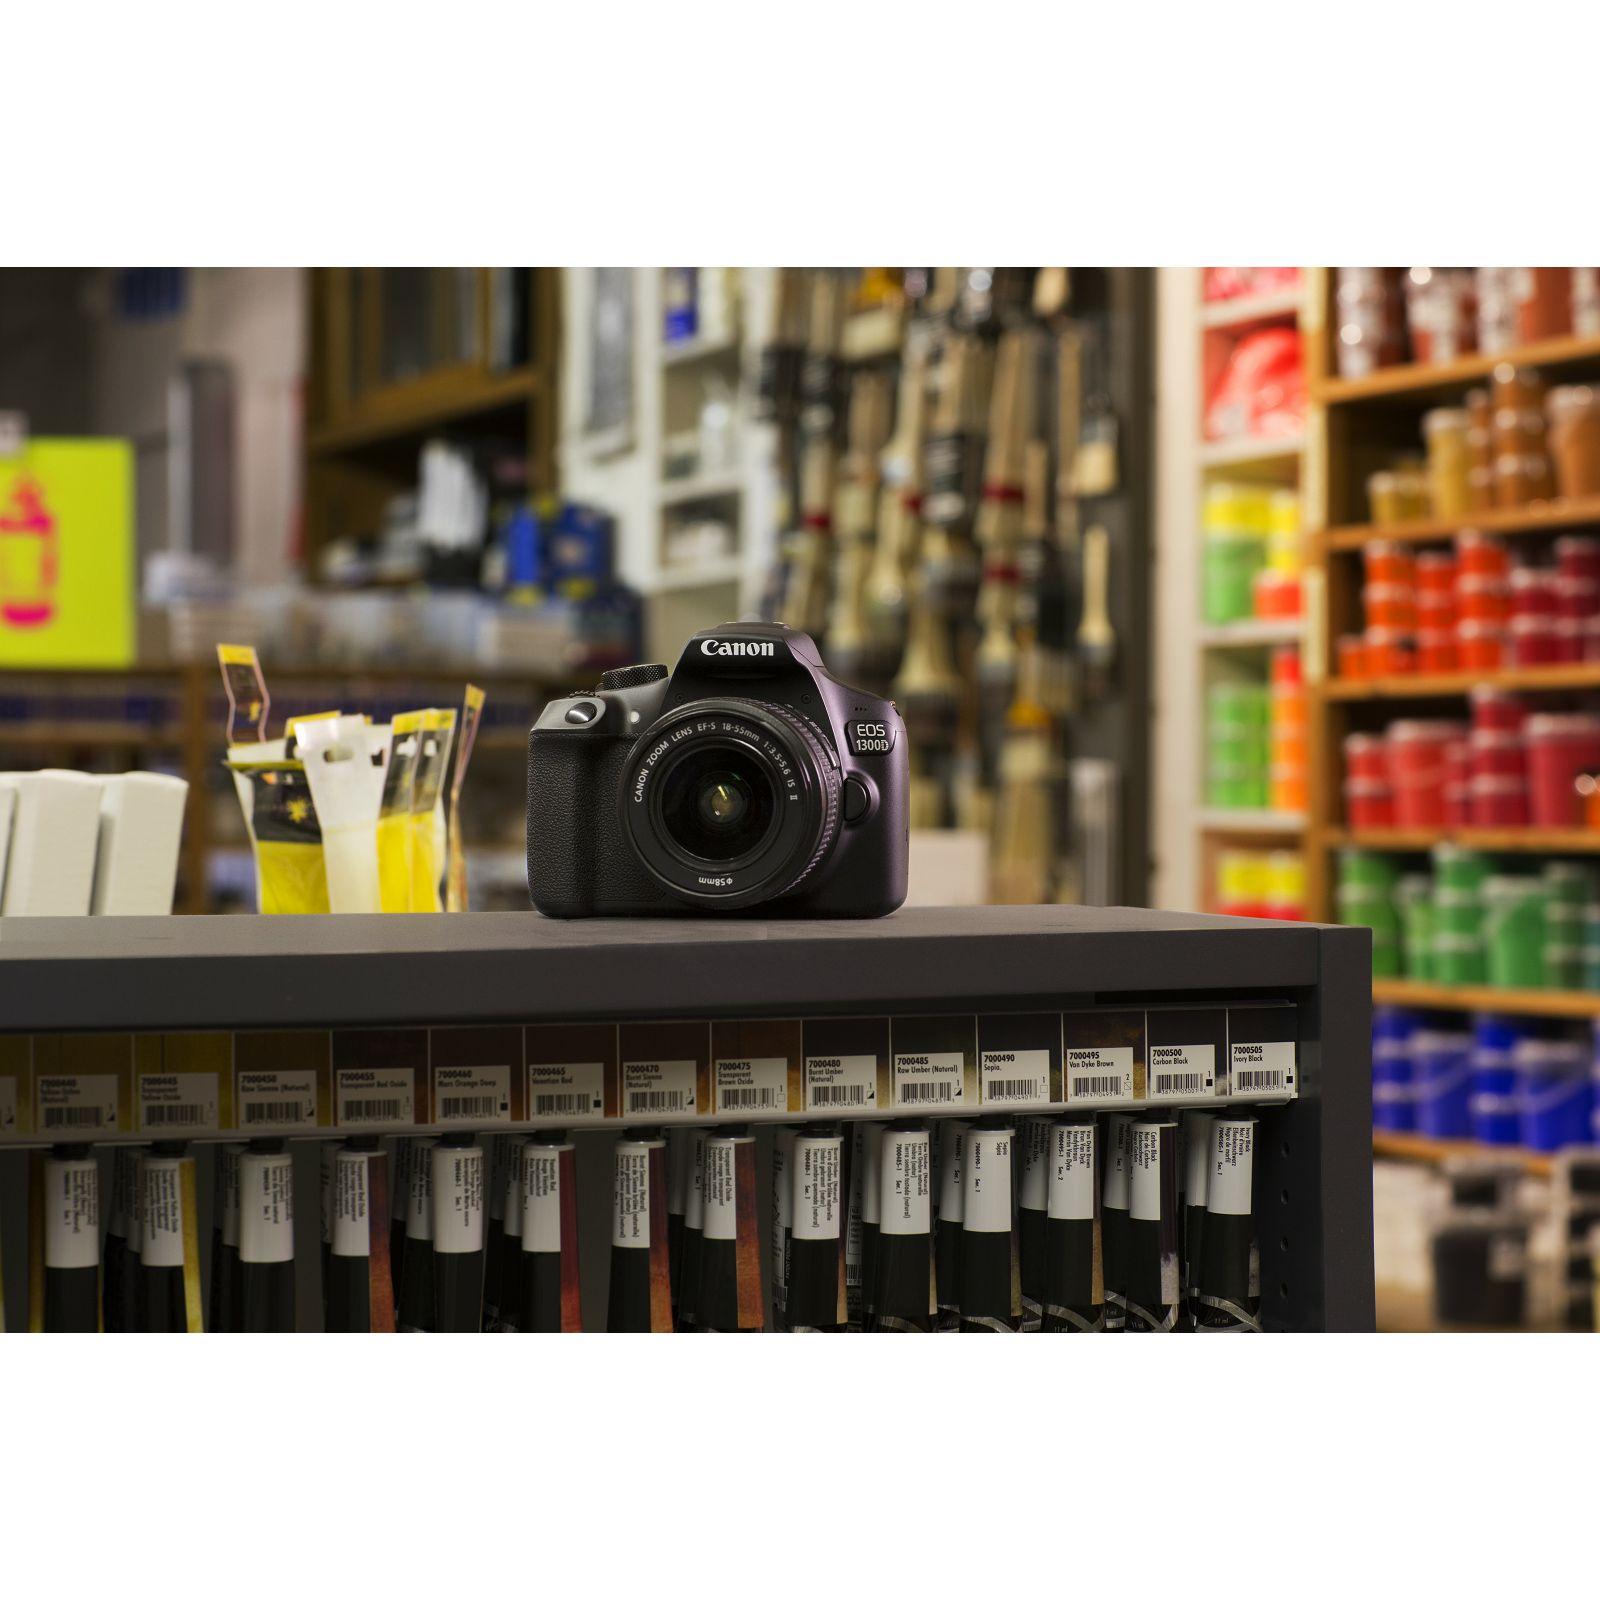 Canon Eos 1300d 18 55 Dc Iii Dslr Digitalni Fotoaparat Objektiv Kit